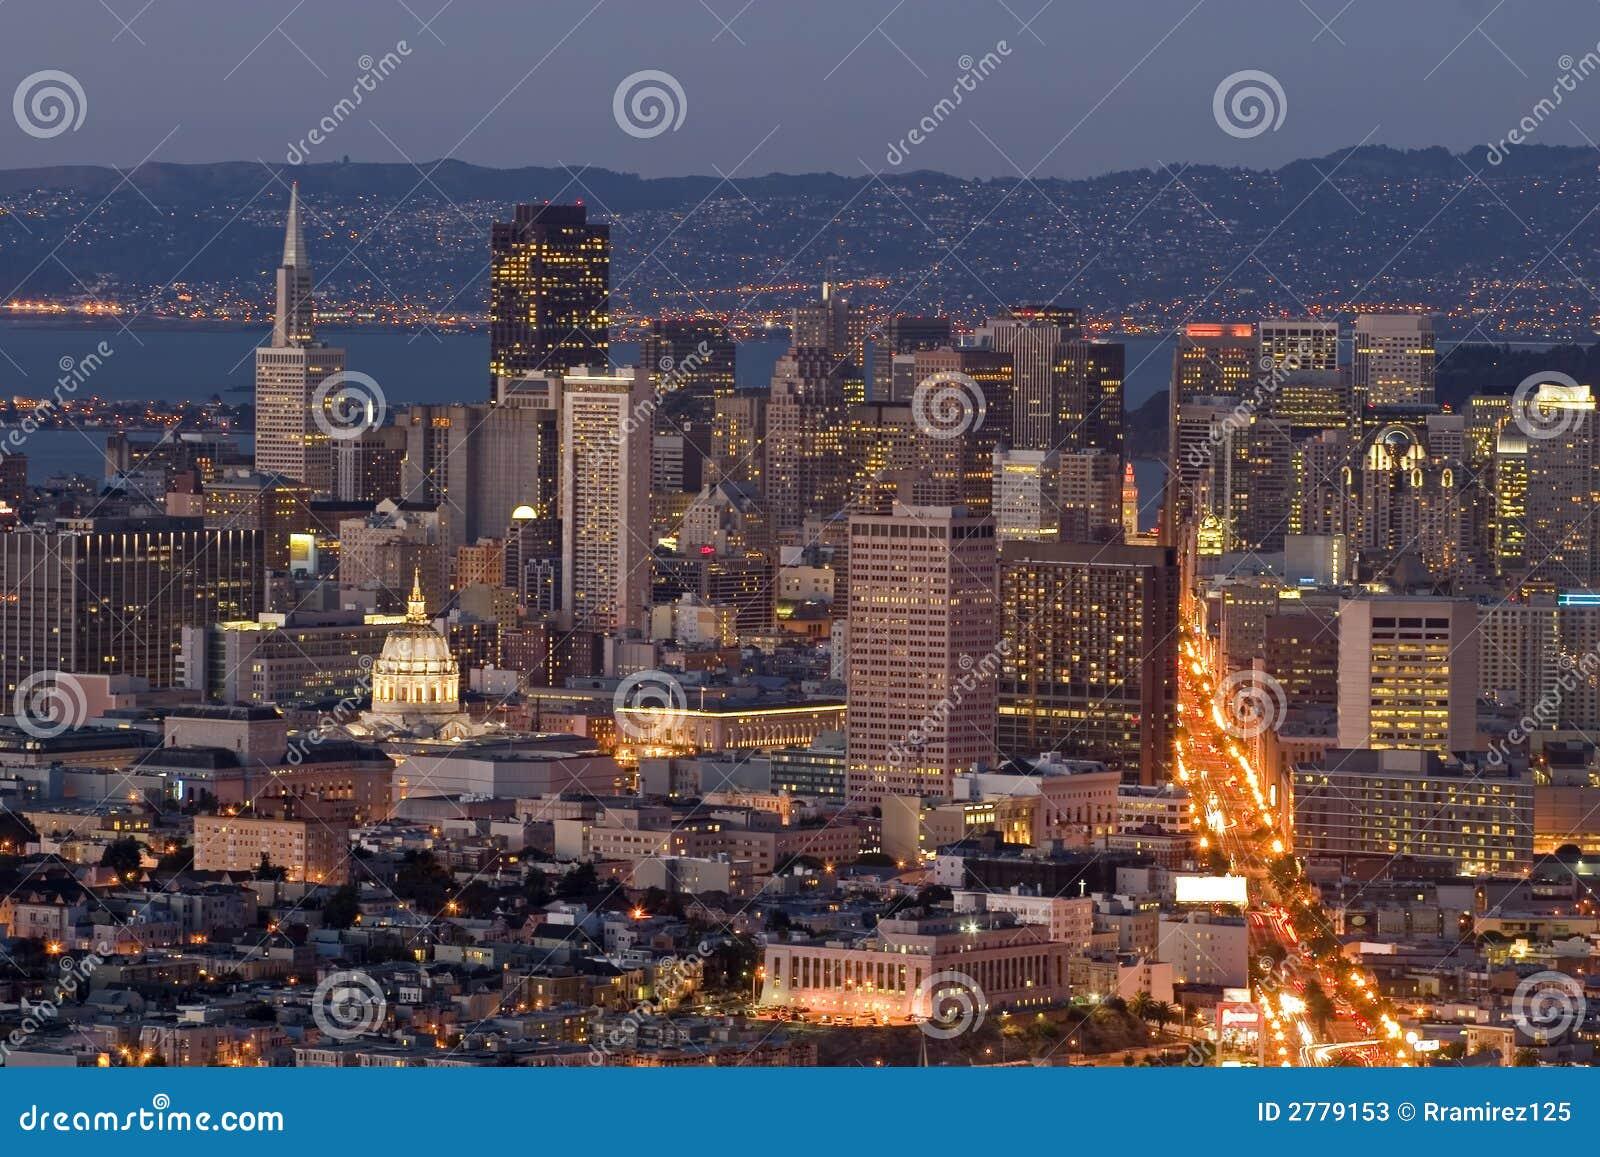 District dusk financial lights